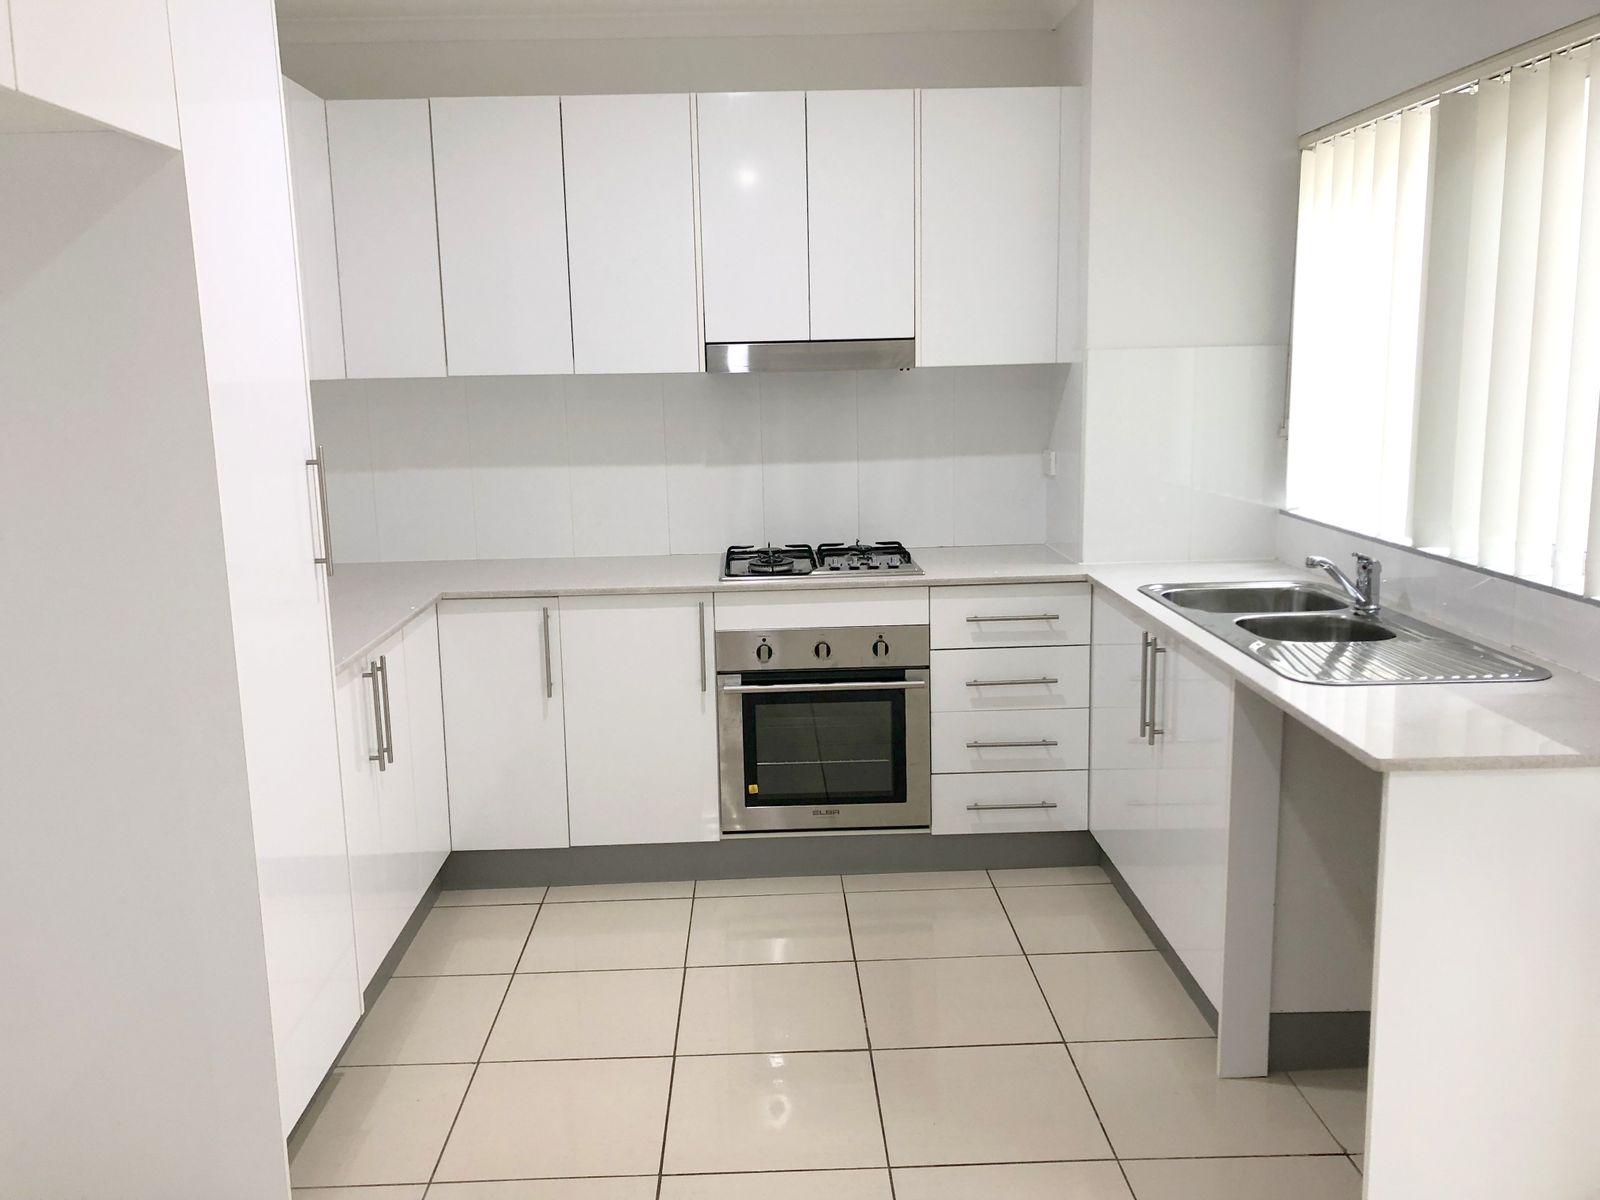 18/46 Mulgoa Road, Jamisontown, NSW 2750